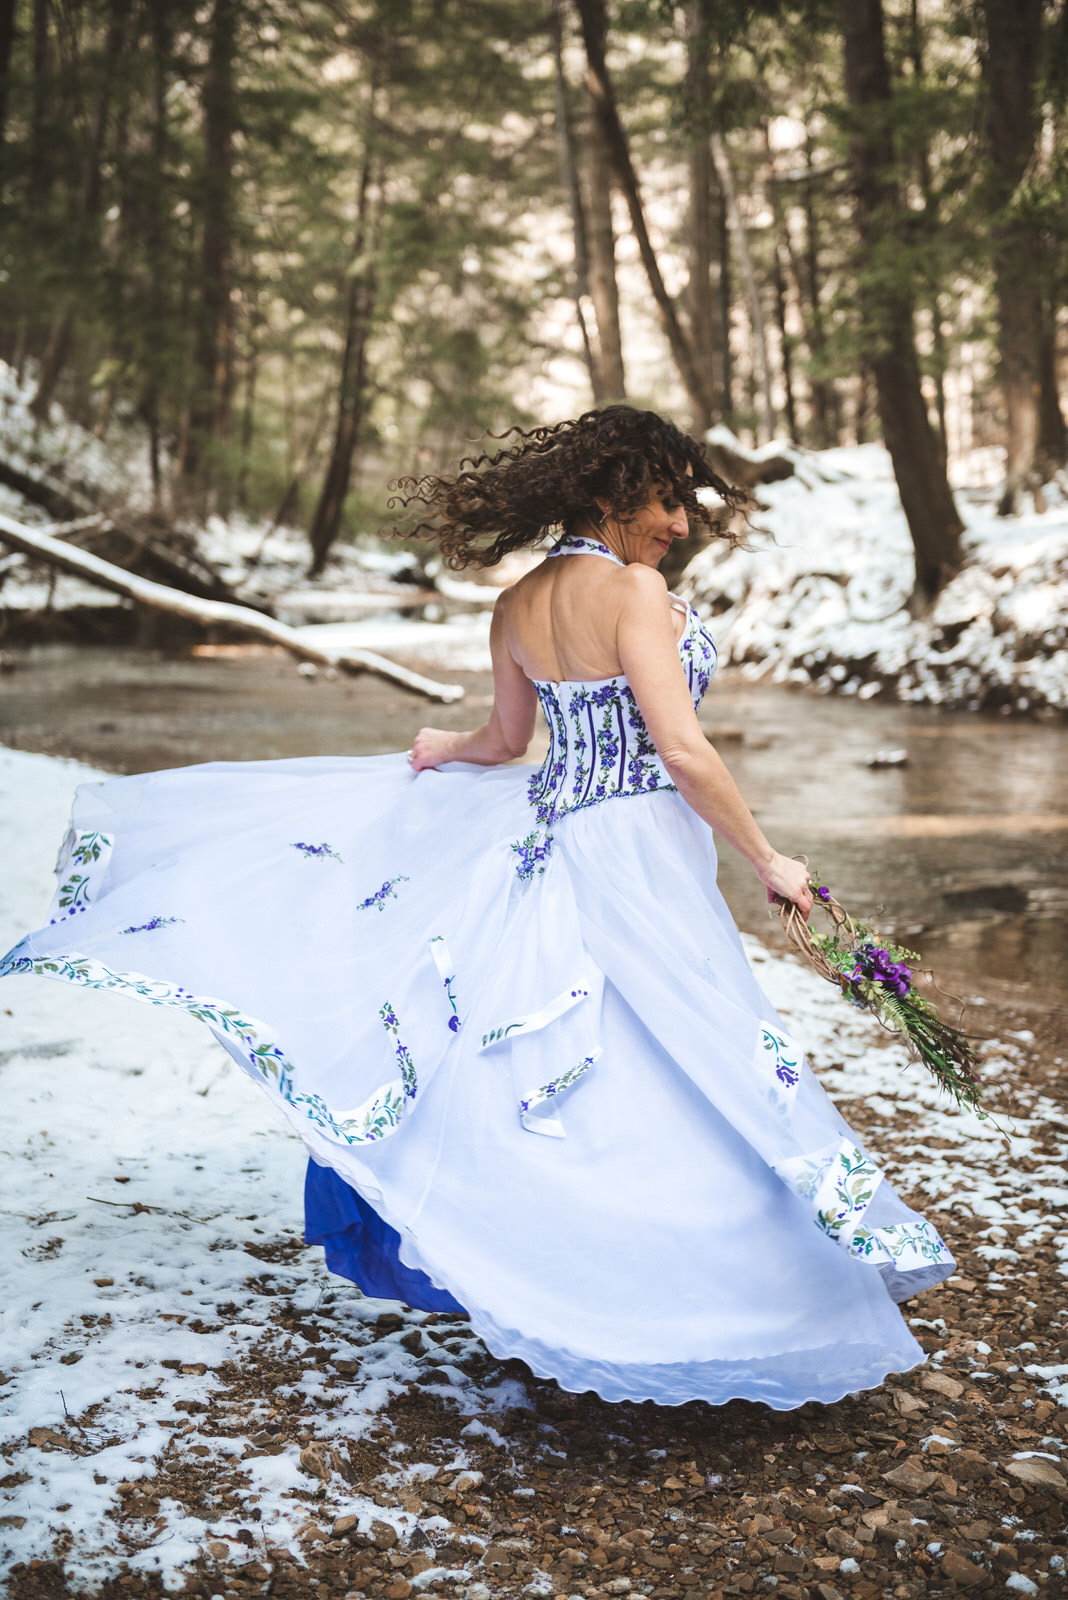 painted-wedding-dress